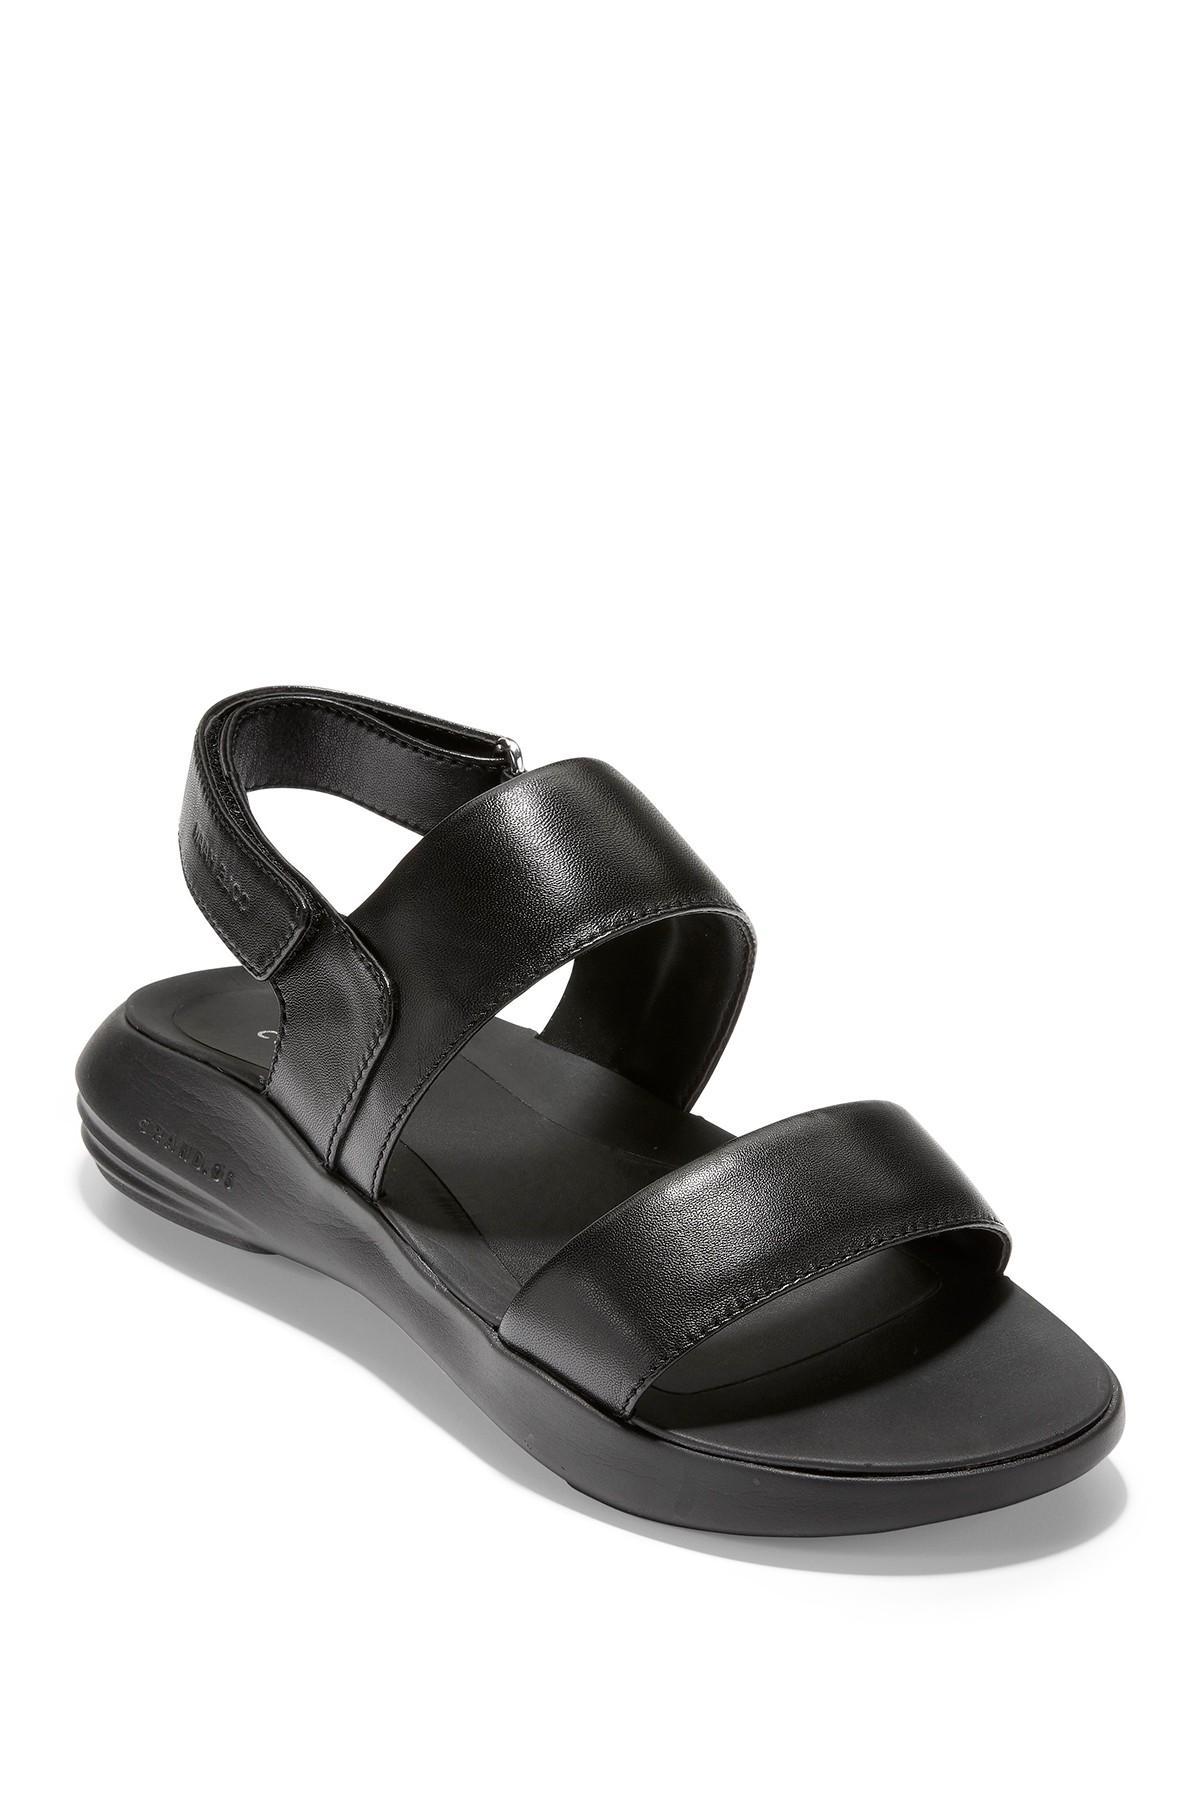 Cole Haan Ella Zerogrand Leather Sandal